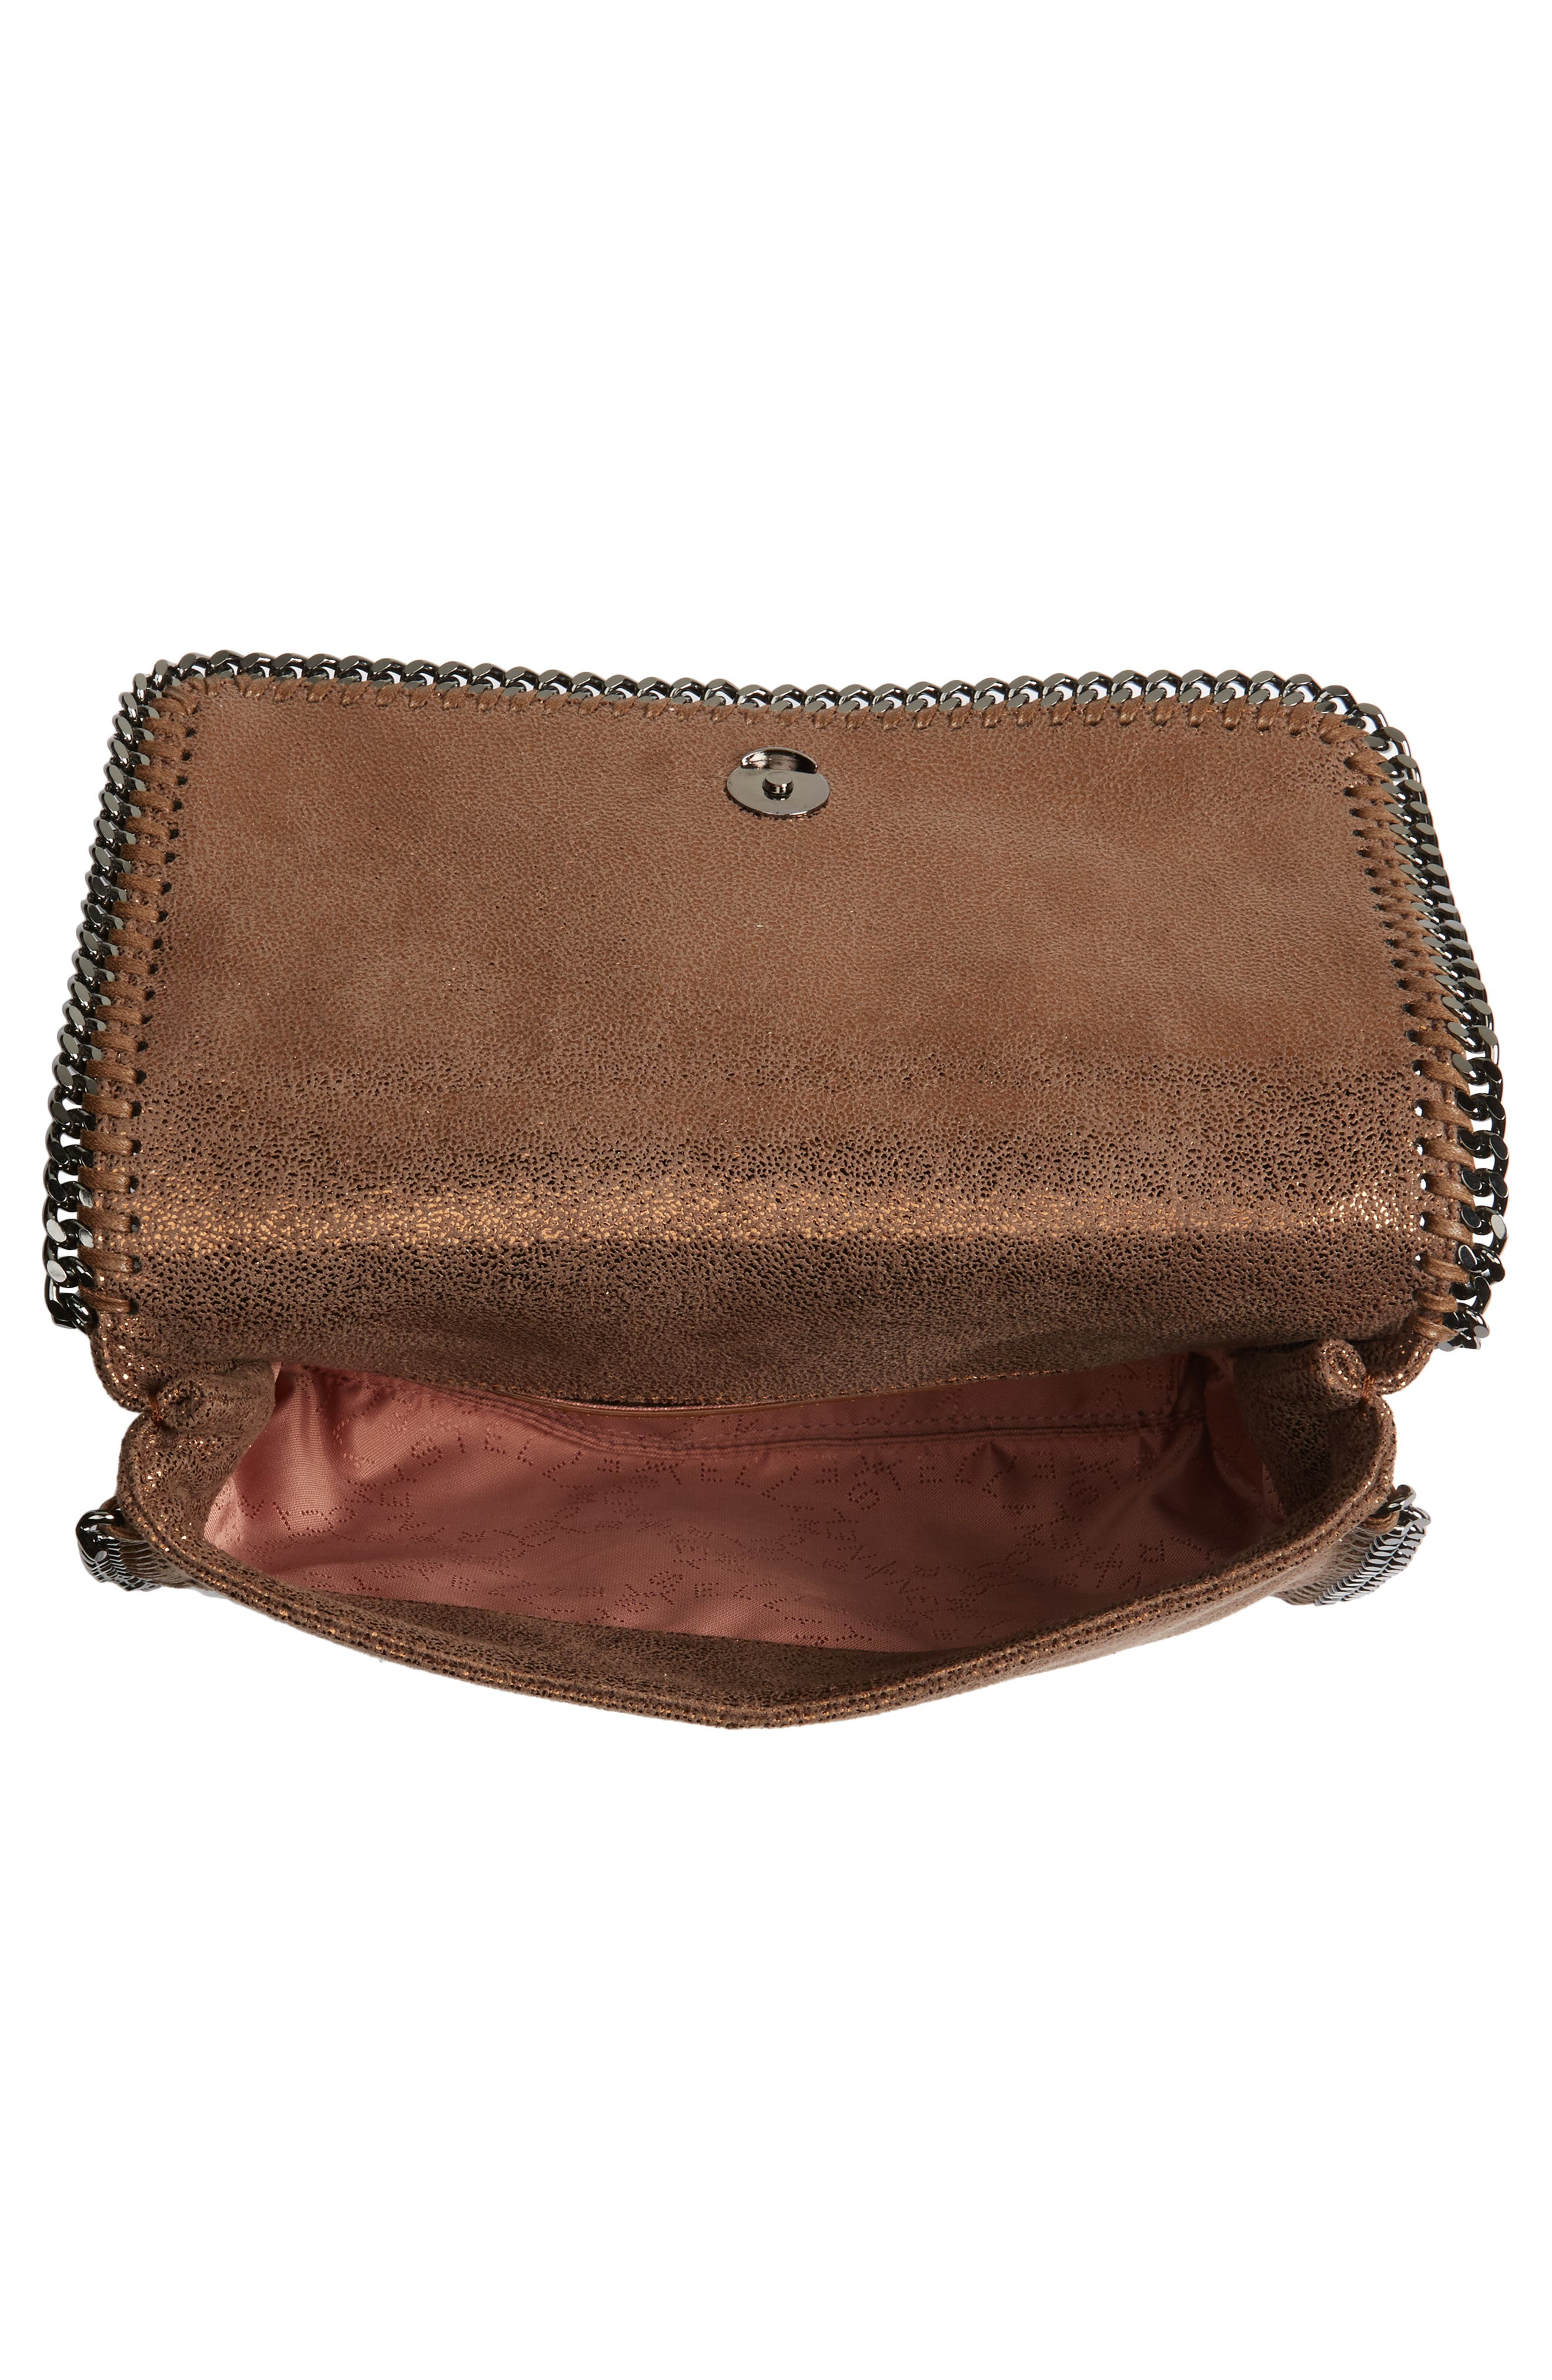 Falabella Metallic Faux Leather Convertible Shoulder Bag,                             Alternate thumbnail 4, color,                             200